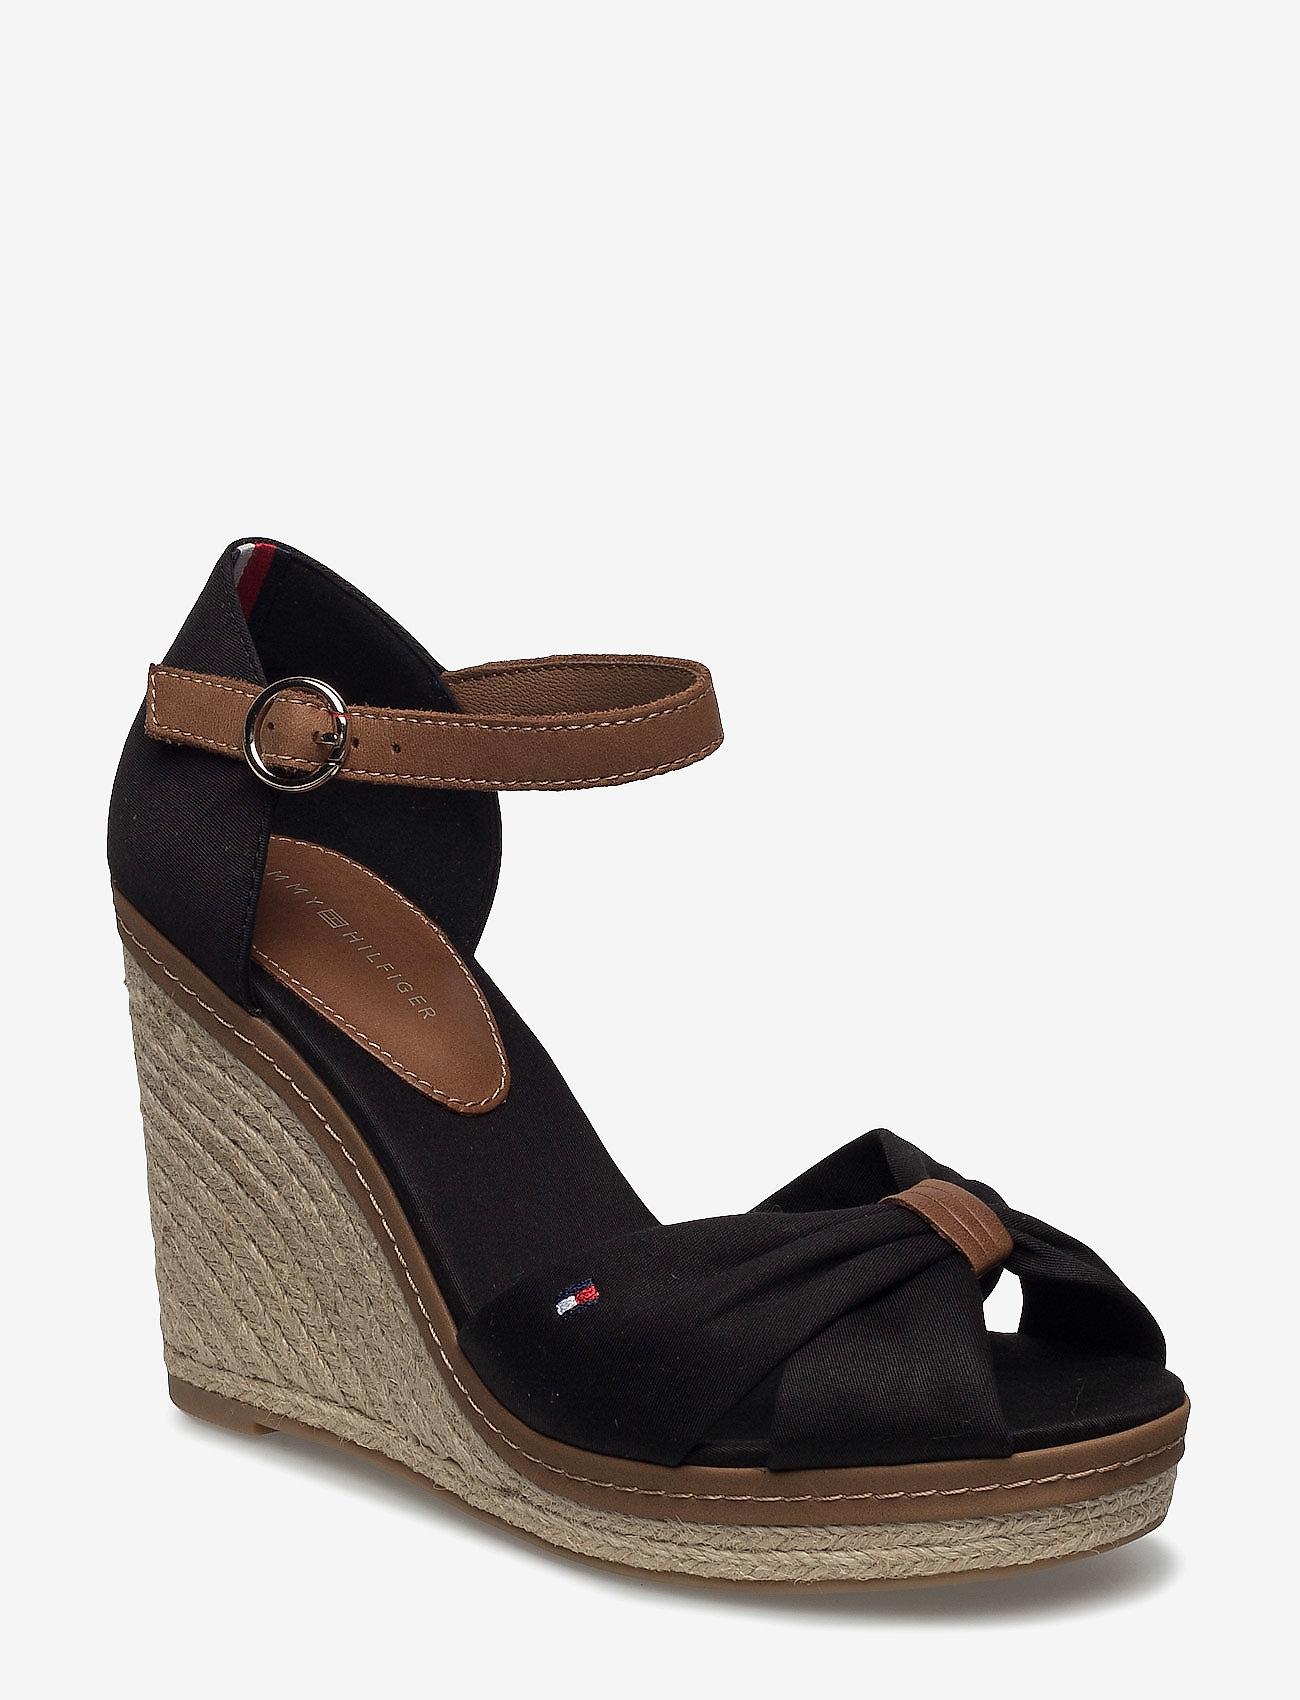 Tommy Hilfiger - ICONIC ELENA SANDAL - heeled espadrilles - black - 0